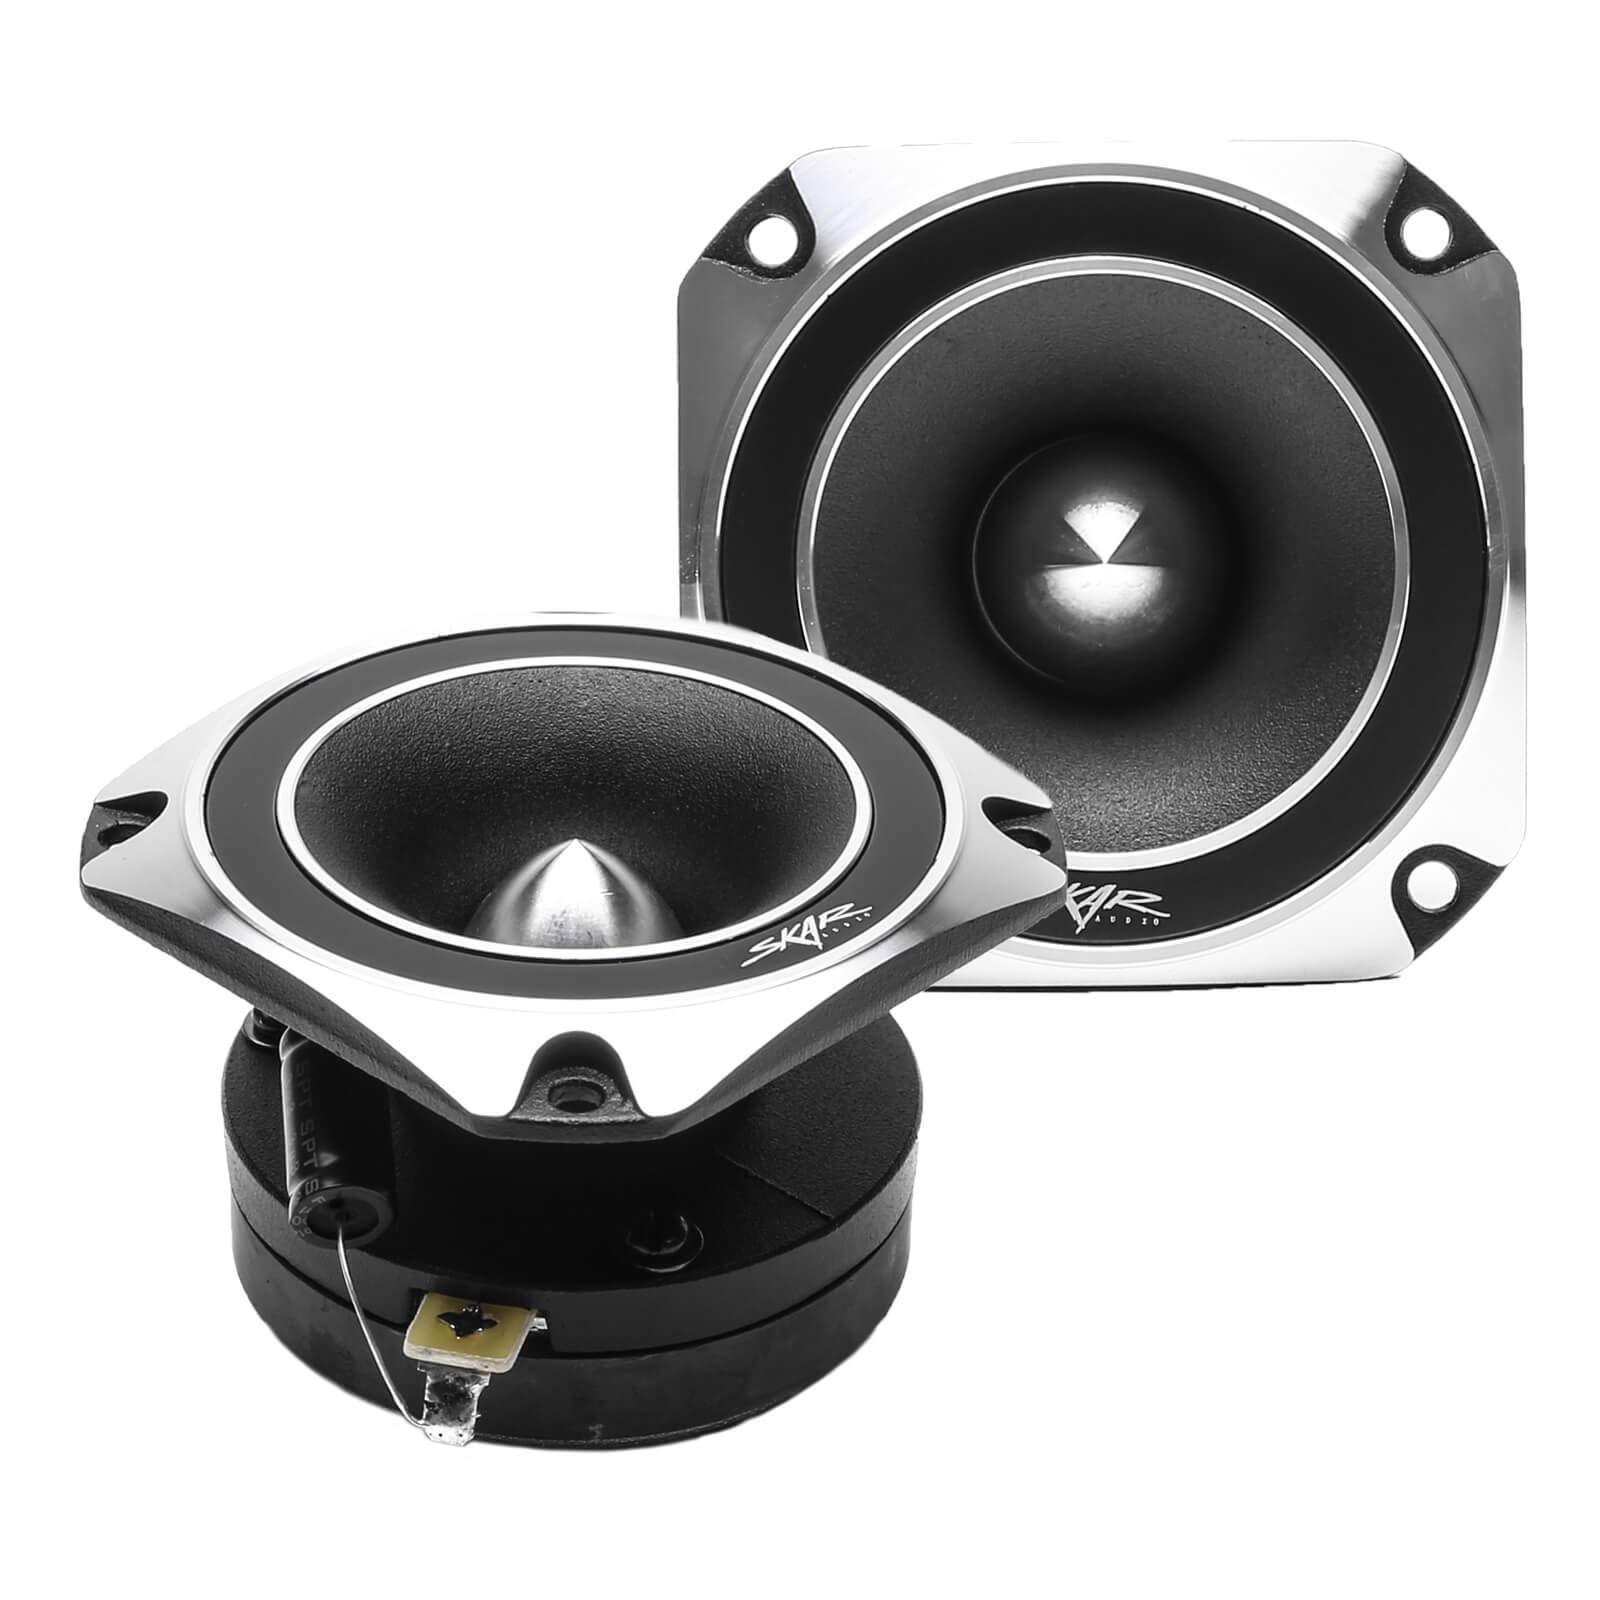 Skar Audio VX35-ST 3.5-Inch 300 Watt RMS High Compression Titanium Bullet Tweeters, Pair by Skar Audio